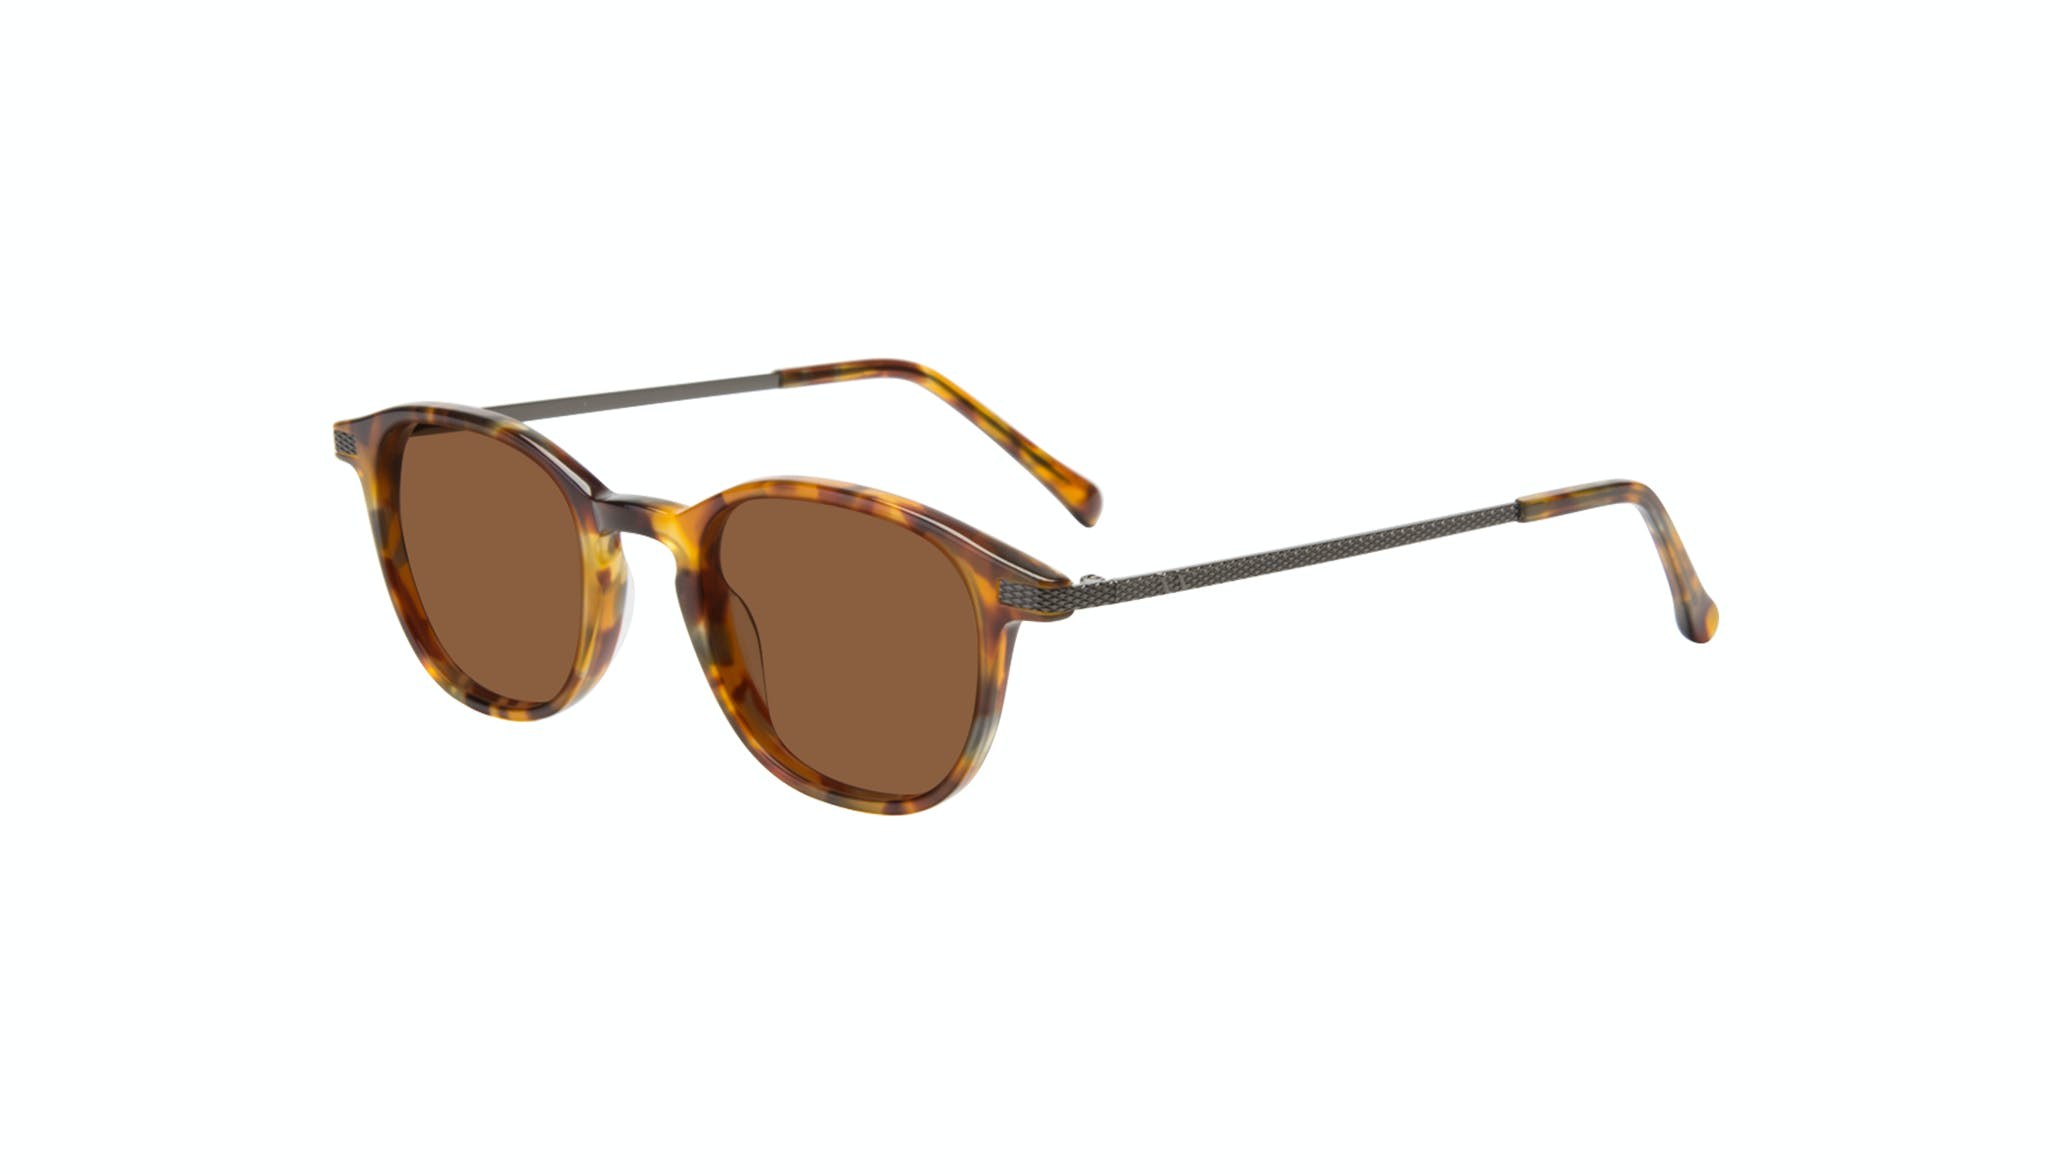 Affordable Fashion Glasses Round Sunglasses Men Tux Havana Tort Tilt